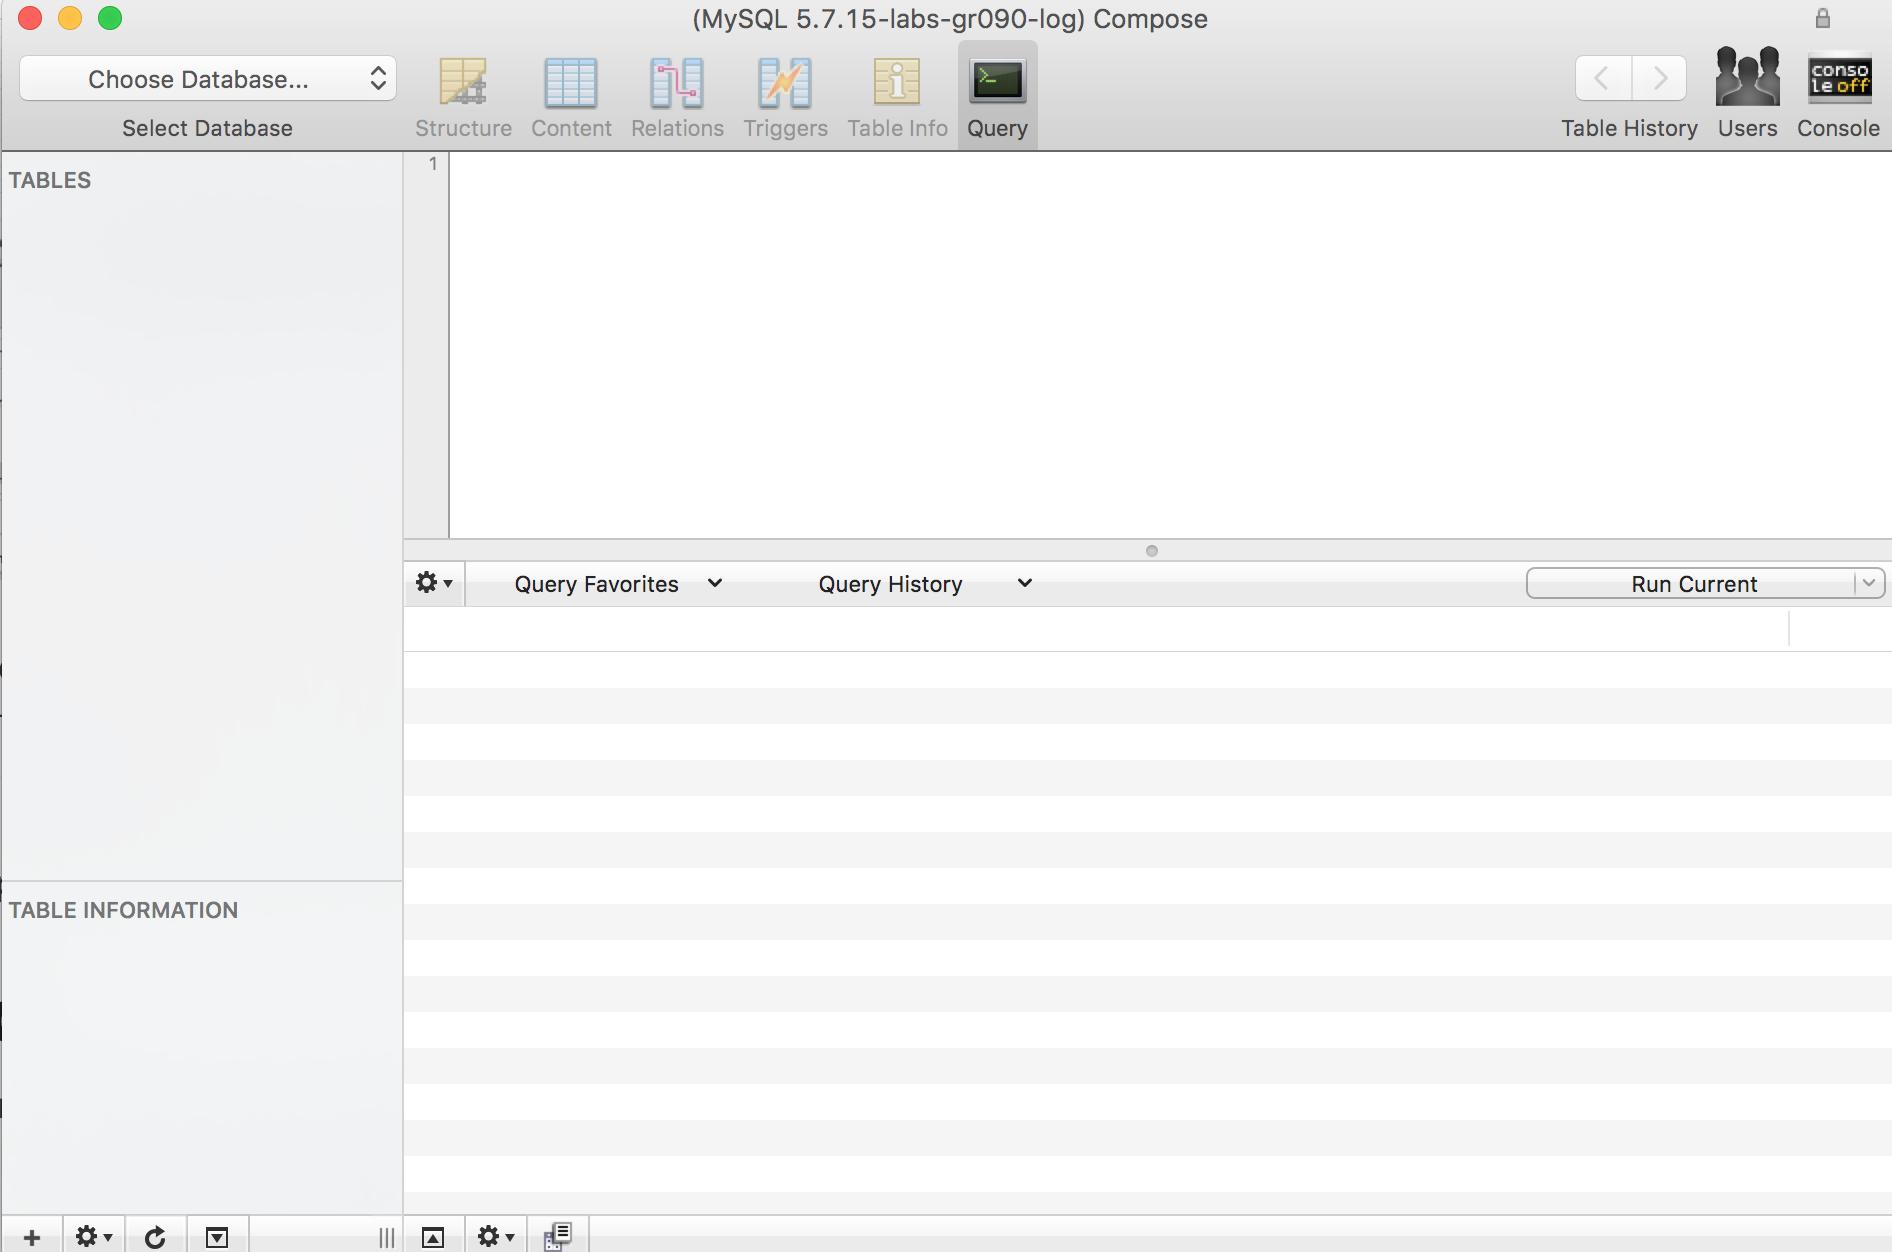 worksheet Pemdas Practice Worksheet database management tools and compose for mysql articles sequel pro